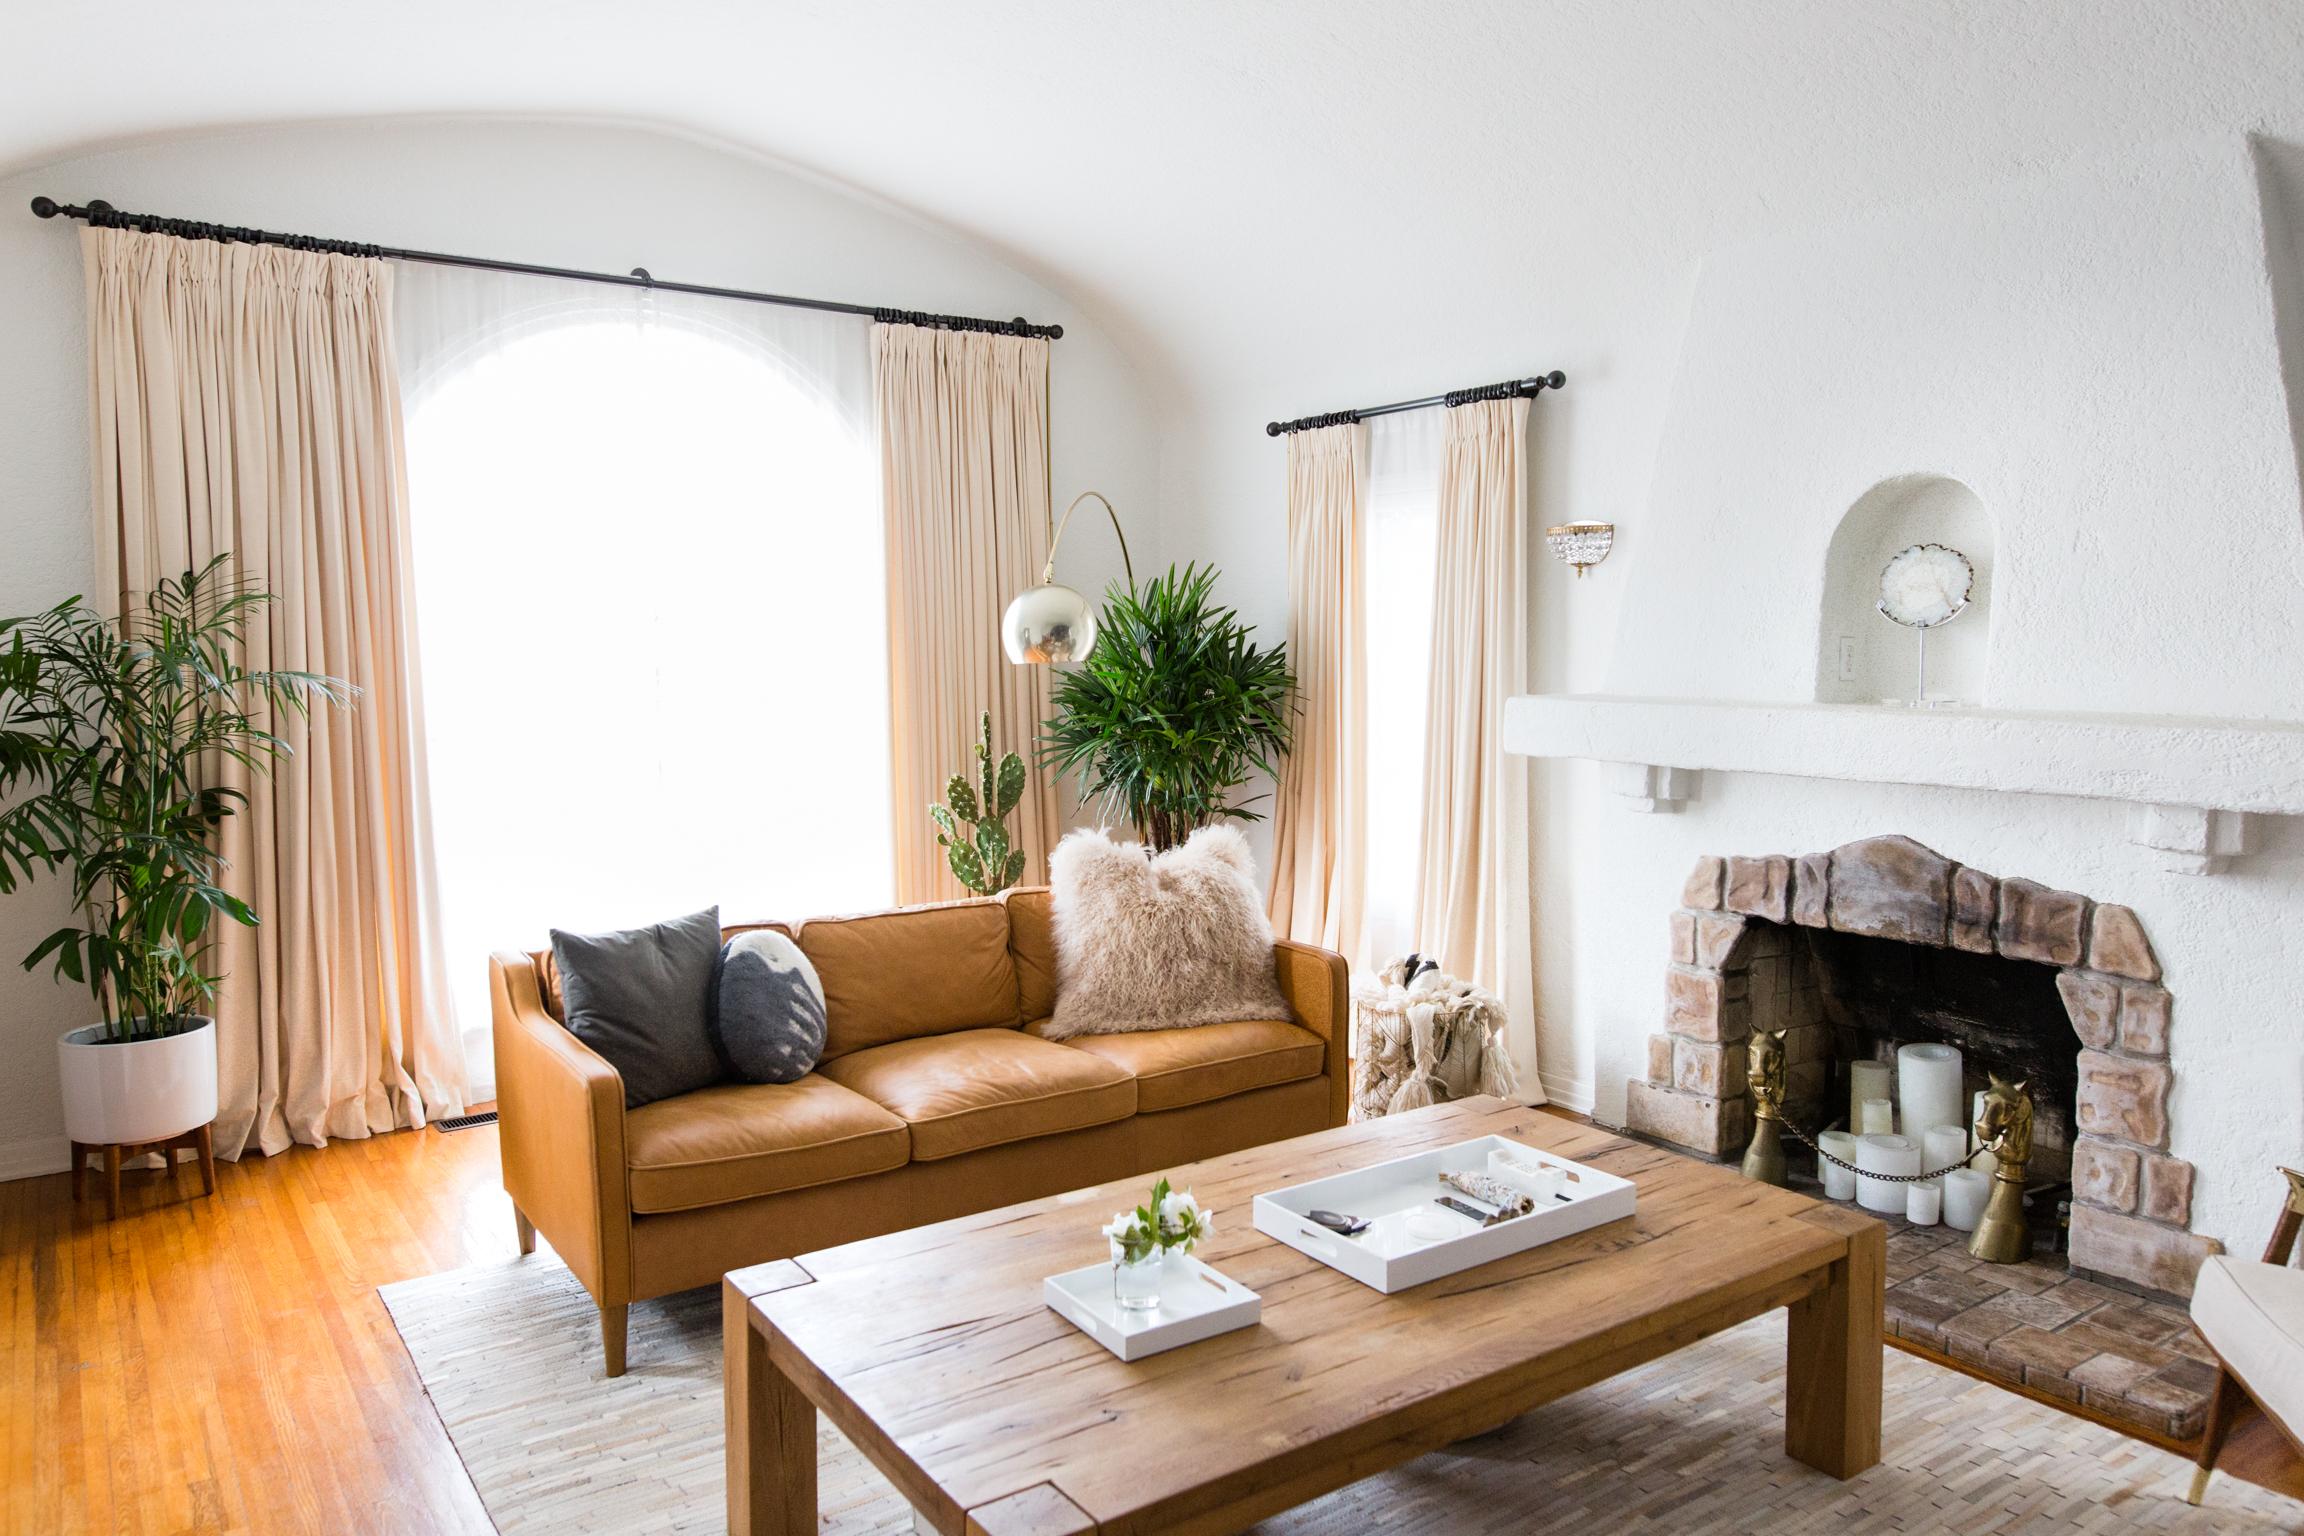 Mr. Kate - A New Living Room Design!